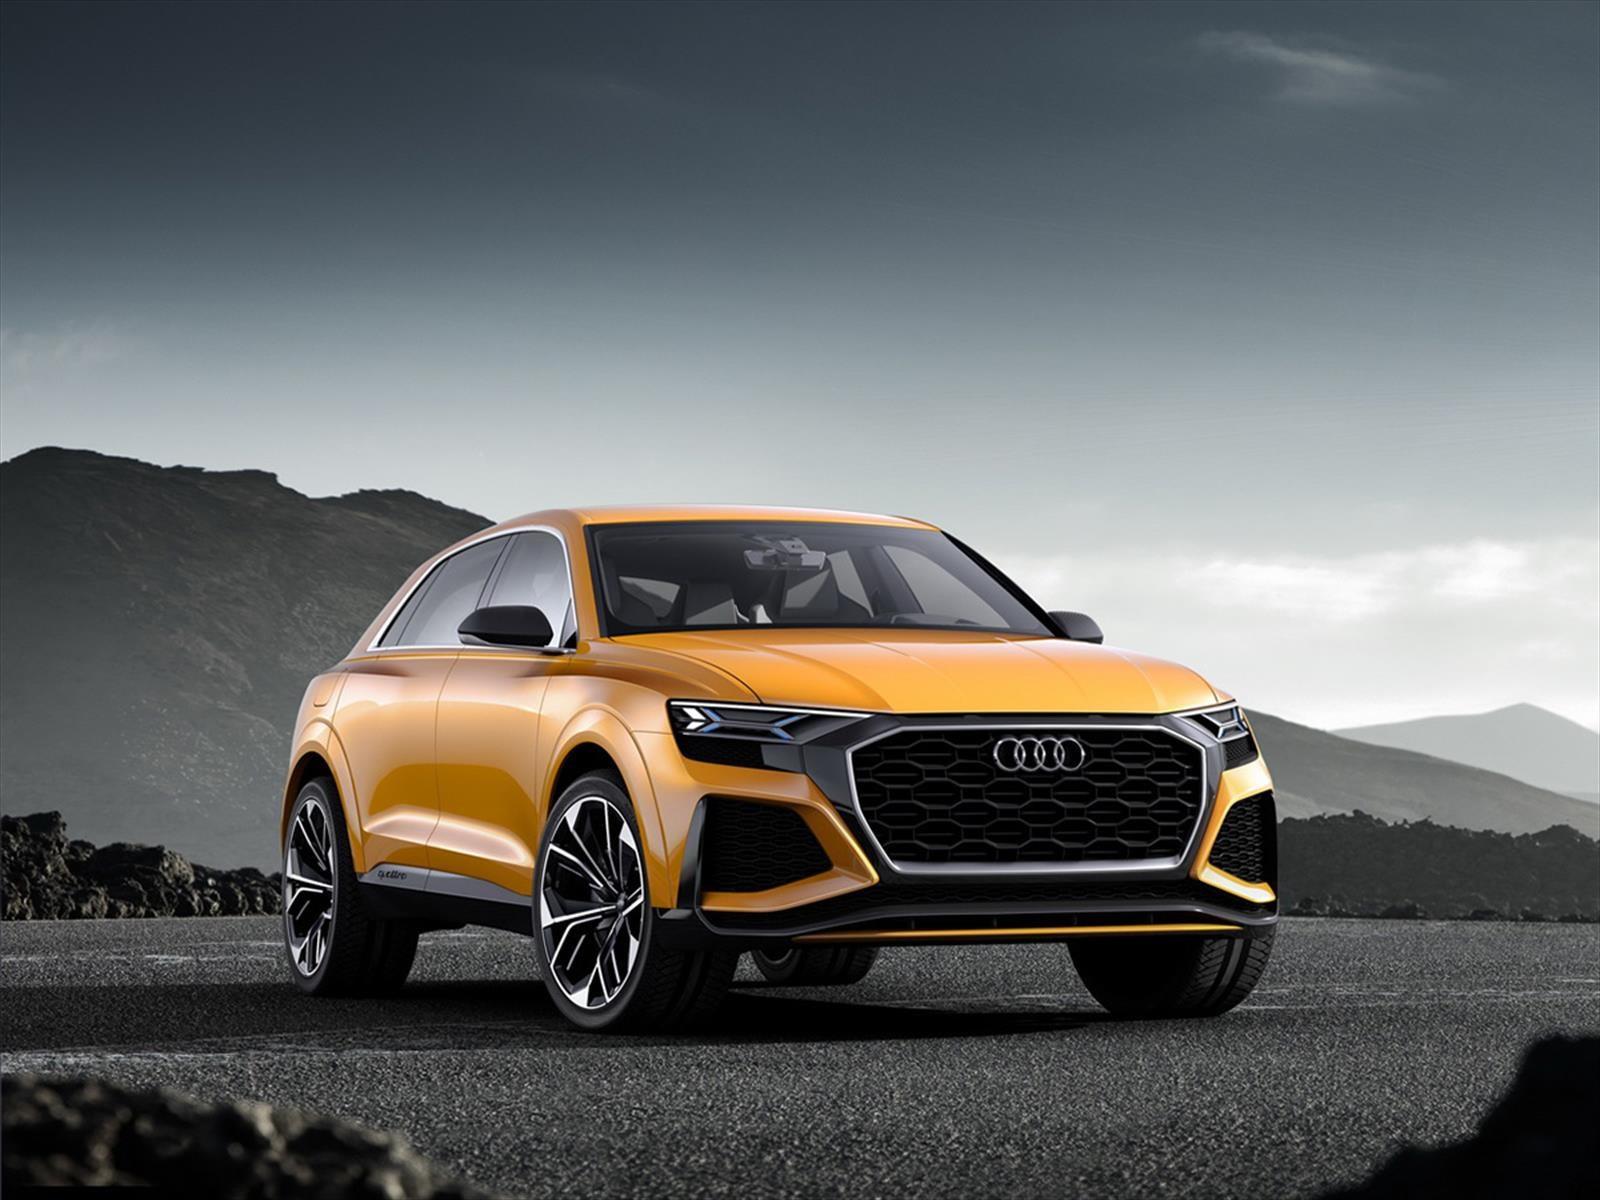 Auto Show de Ginebra 2017 - Audi Q8 Sport - Noticias, novedades y presentaciones - Autocosmos.com